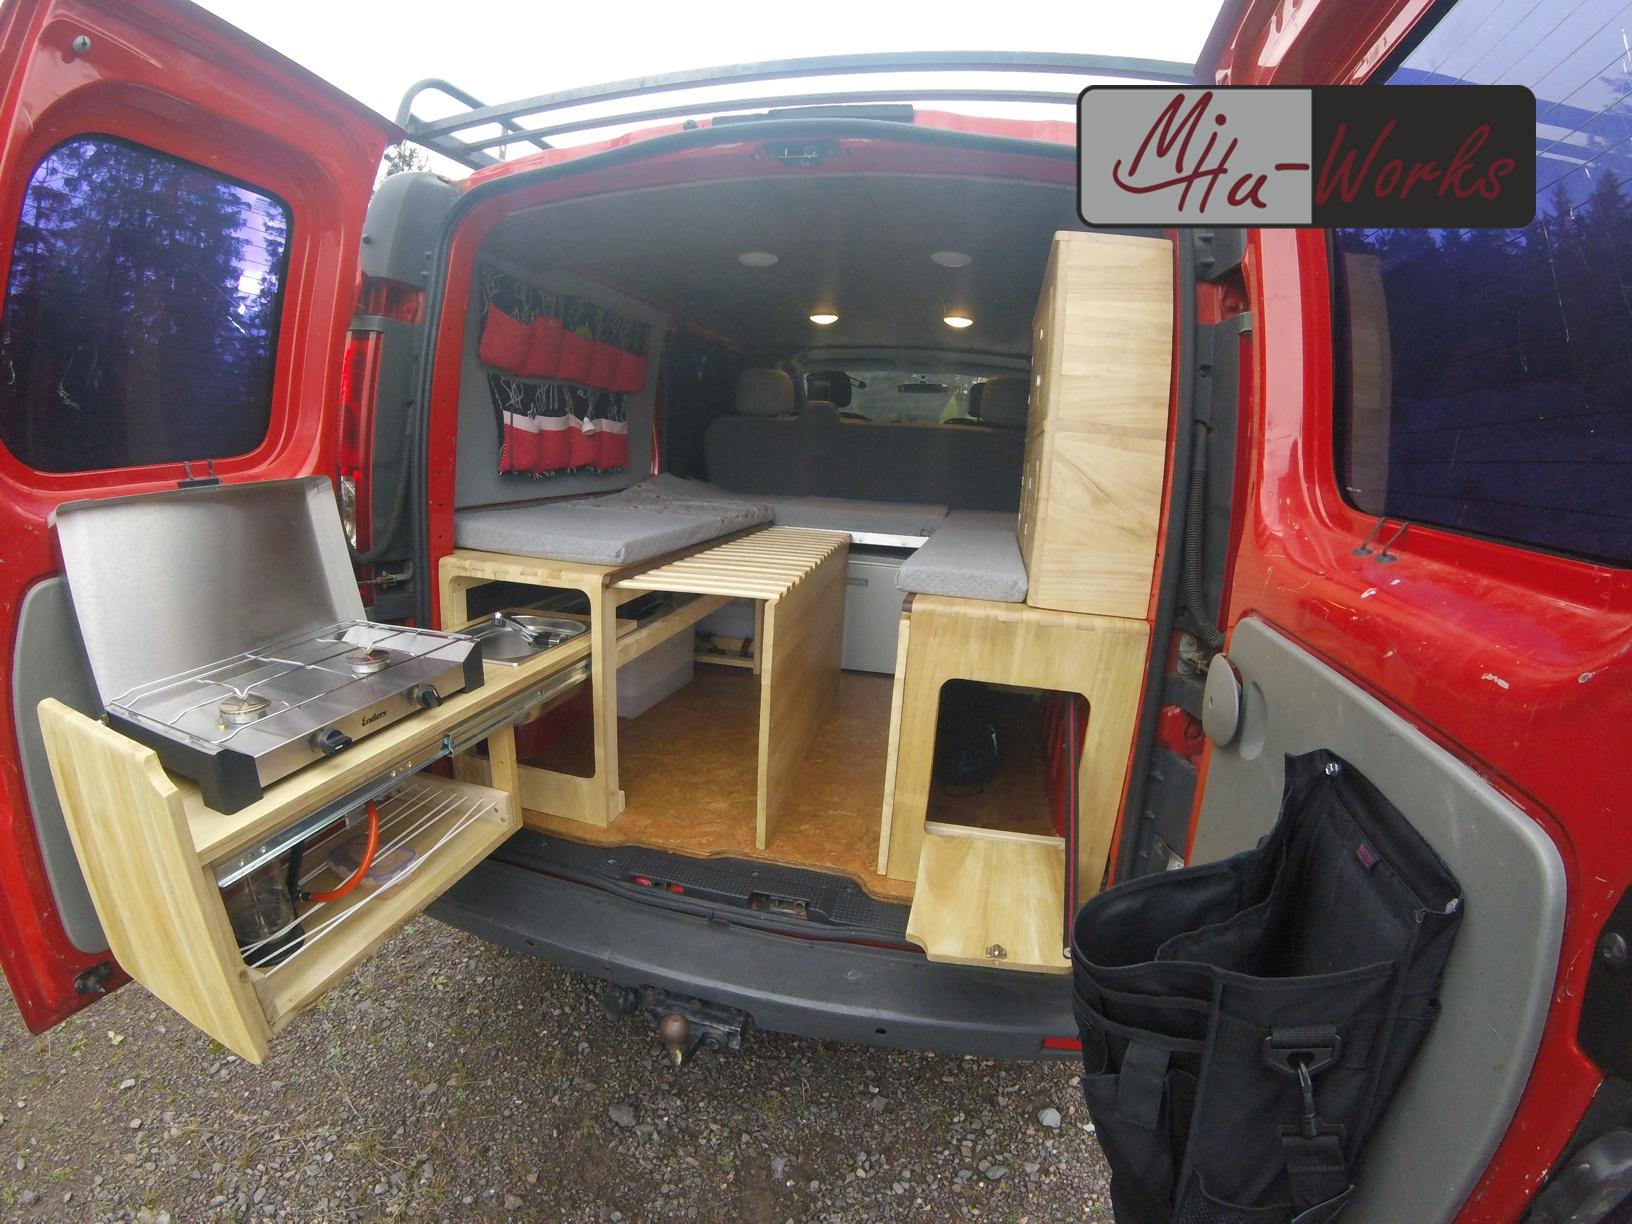 opel vivaro ausbau camping opel vivaro camper renault. Black Bedroom Furniture Sets. Home Design Ideas